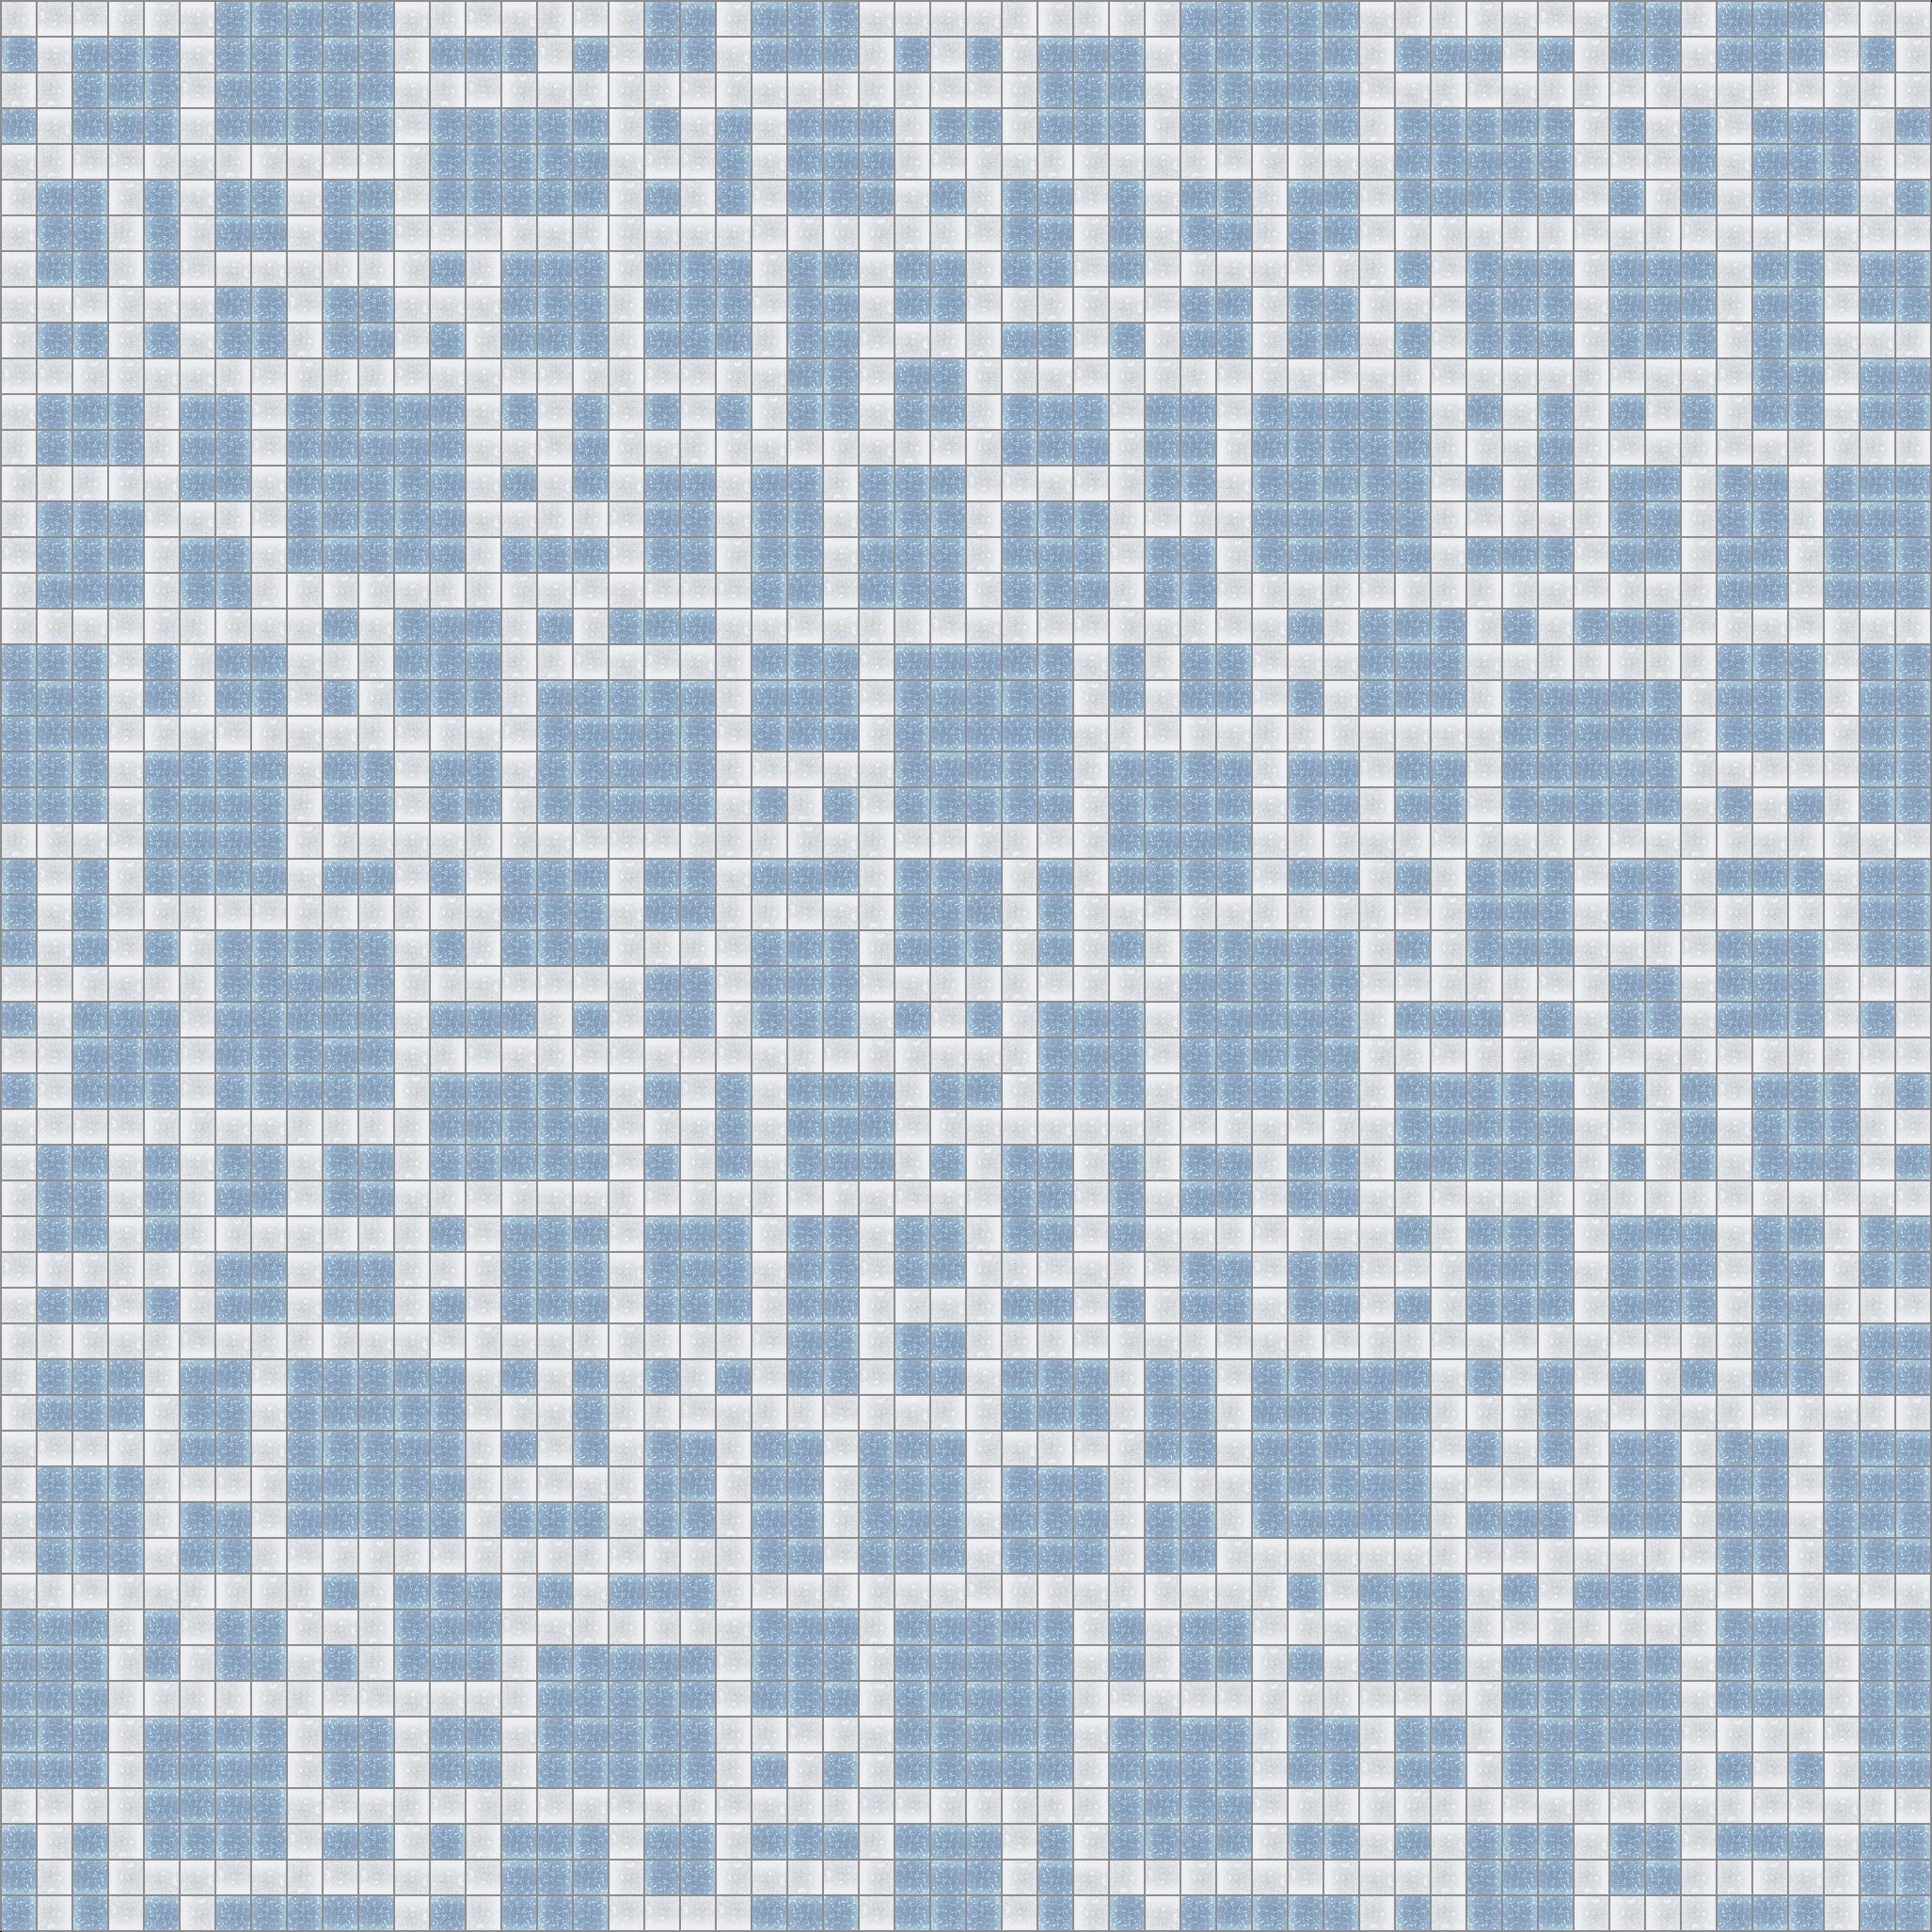 Modern Scatter Mosaic Tile Pattern | Modern Design | Mosaic Loft ...